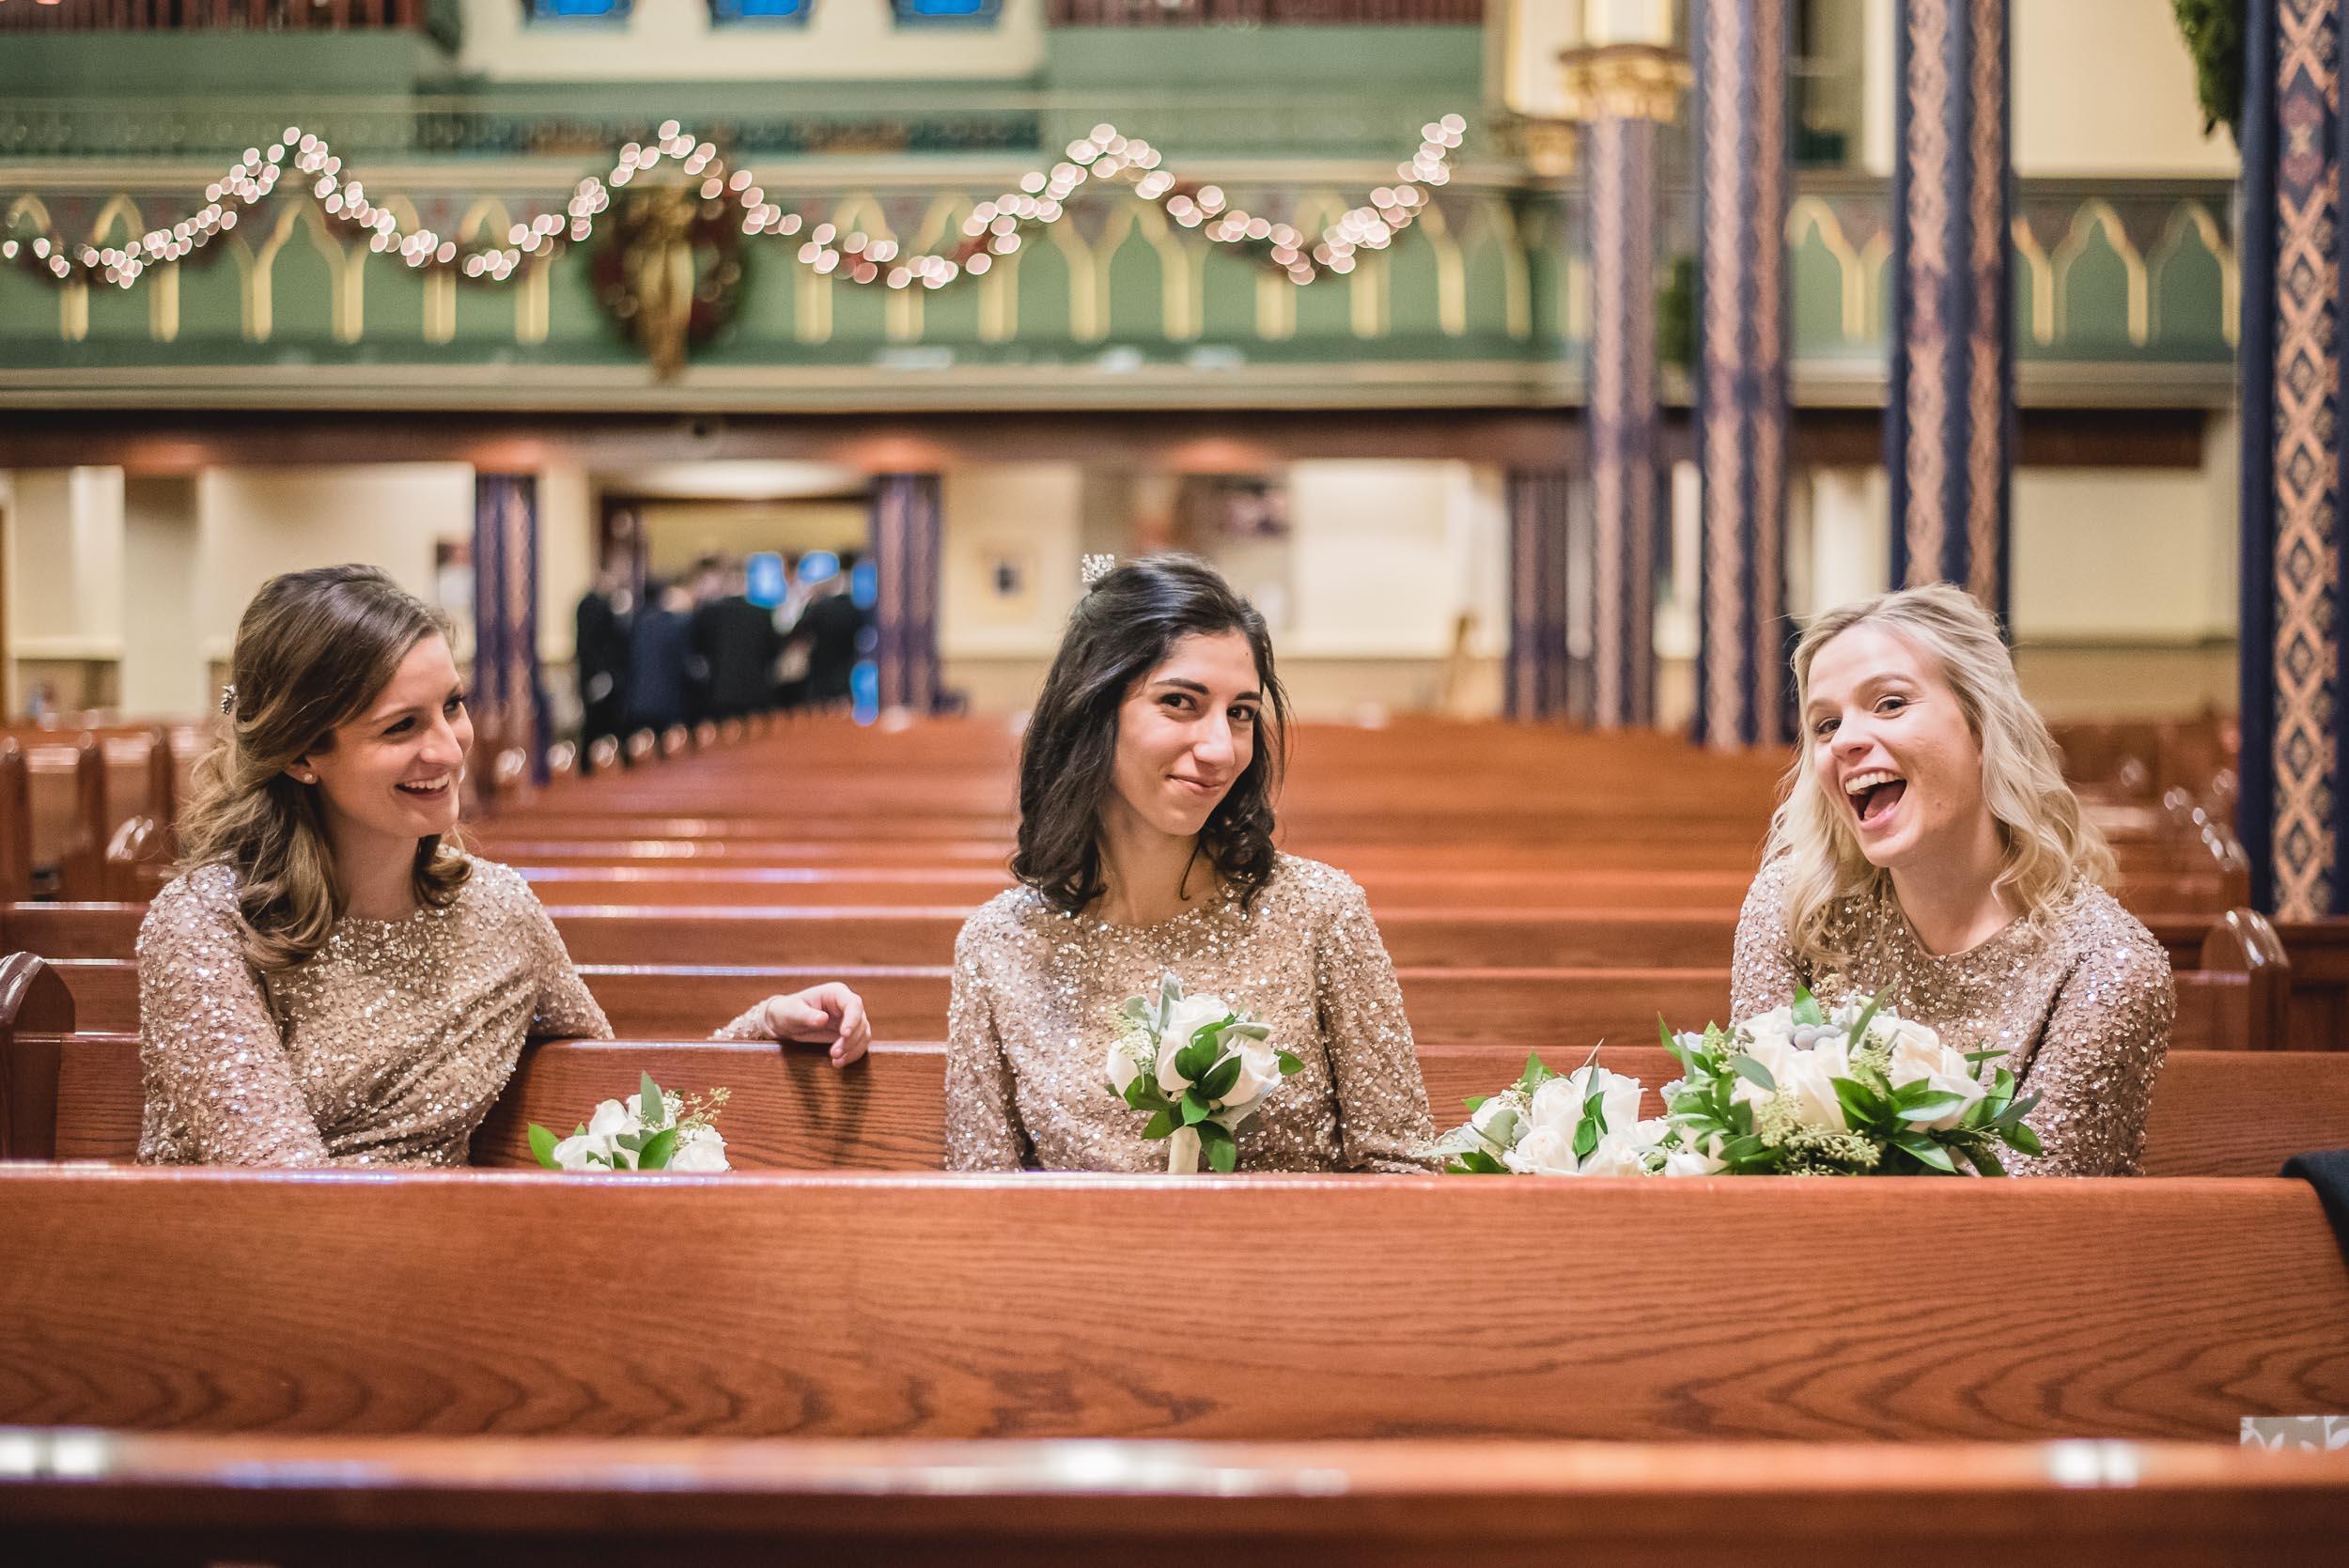 katie_mathia_wedding_church_morristown_new_jersey(3of3).jpg